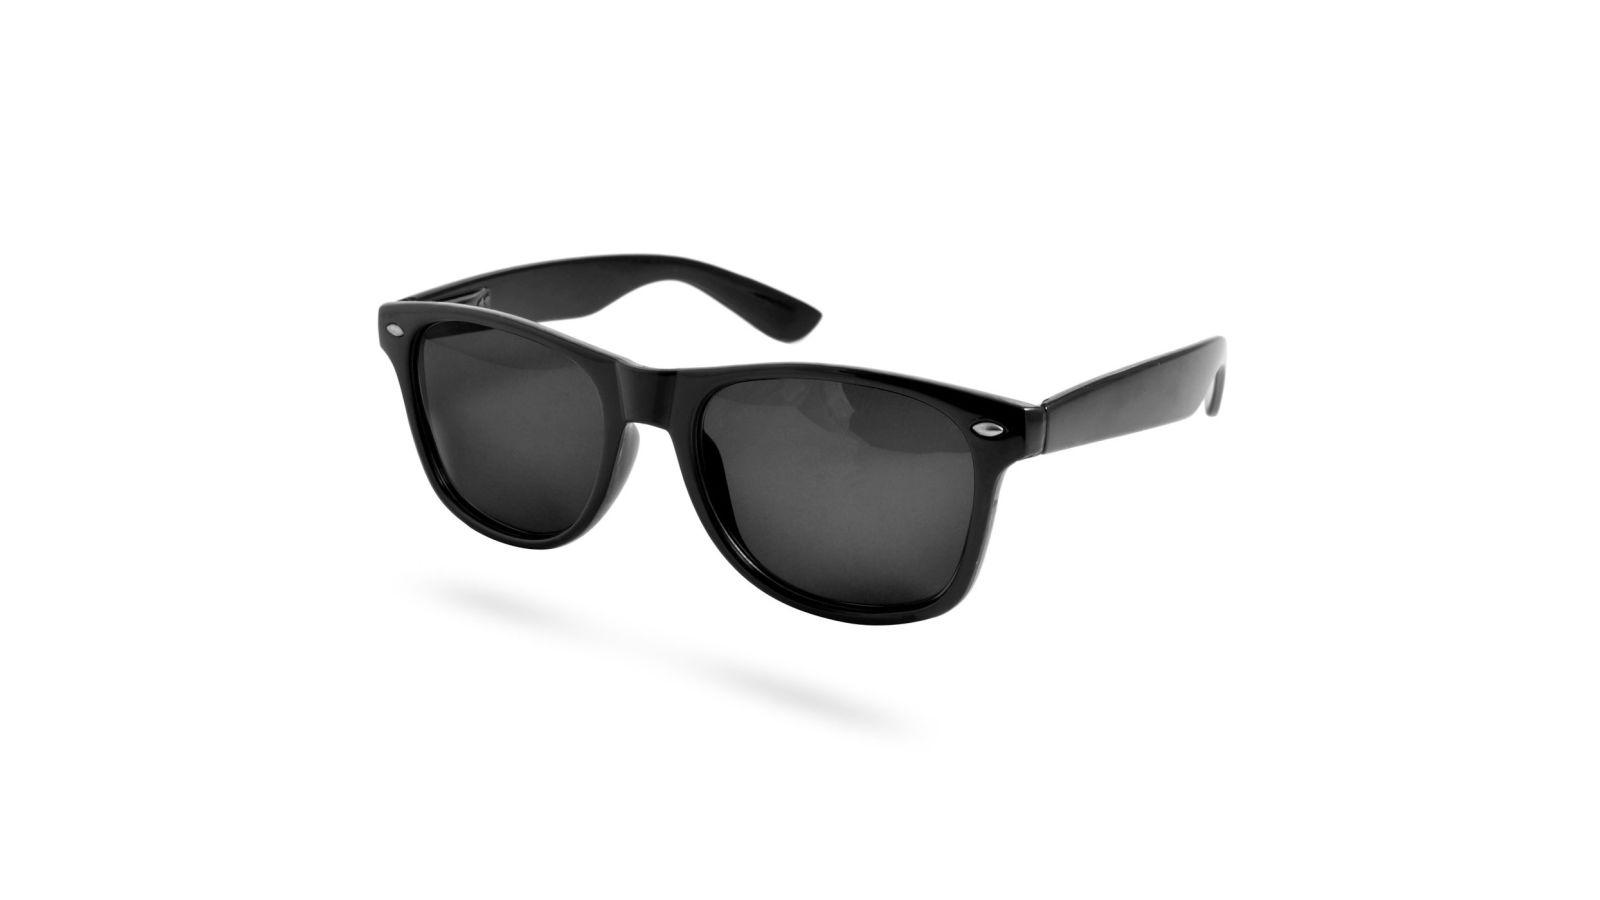 f9d9eafdda Μαύρα Ρετρό Γυαλιά ηλίου